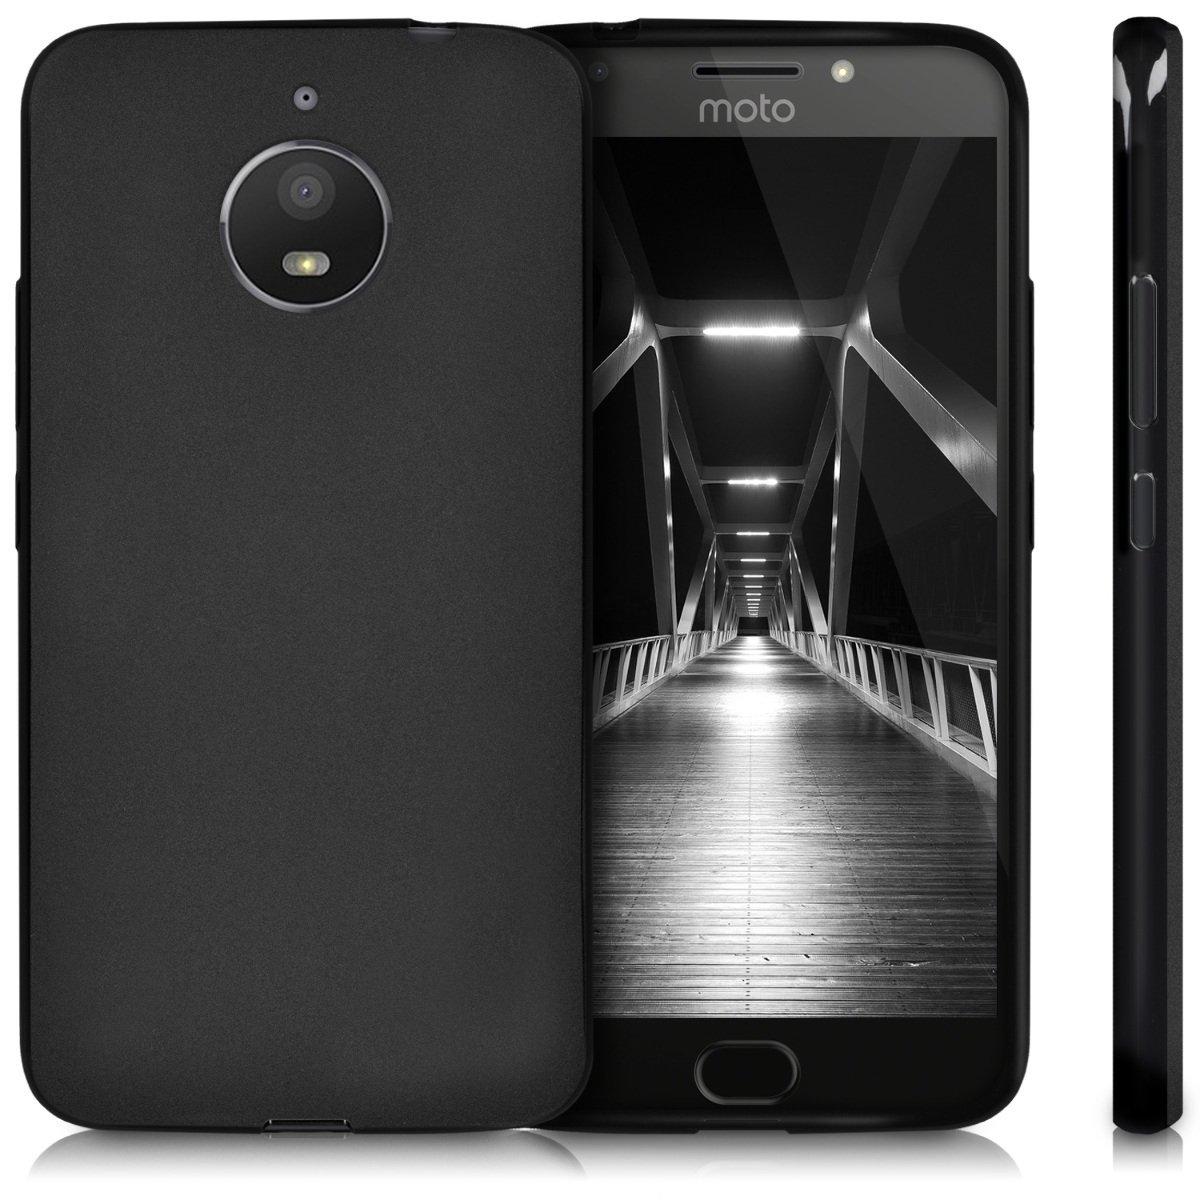 KW Θήκη Σιλικόνης Motorola Moto E4 Plus - Black (42356.47)